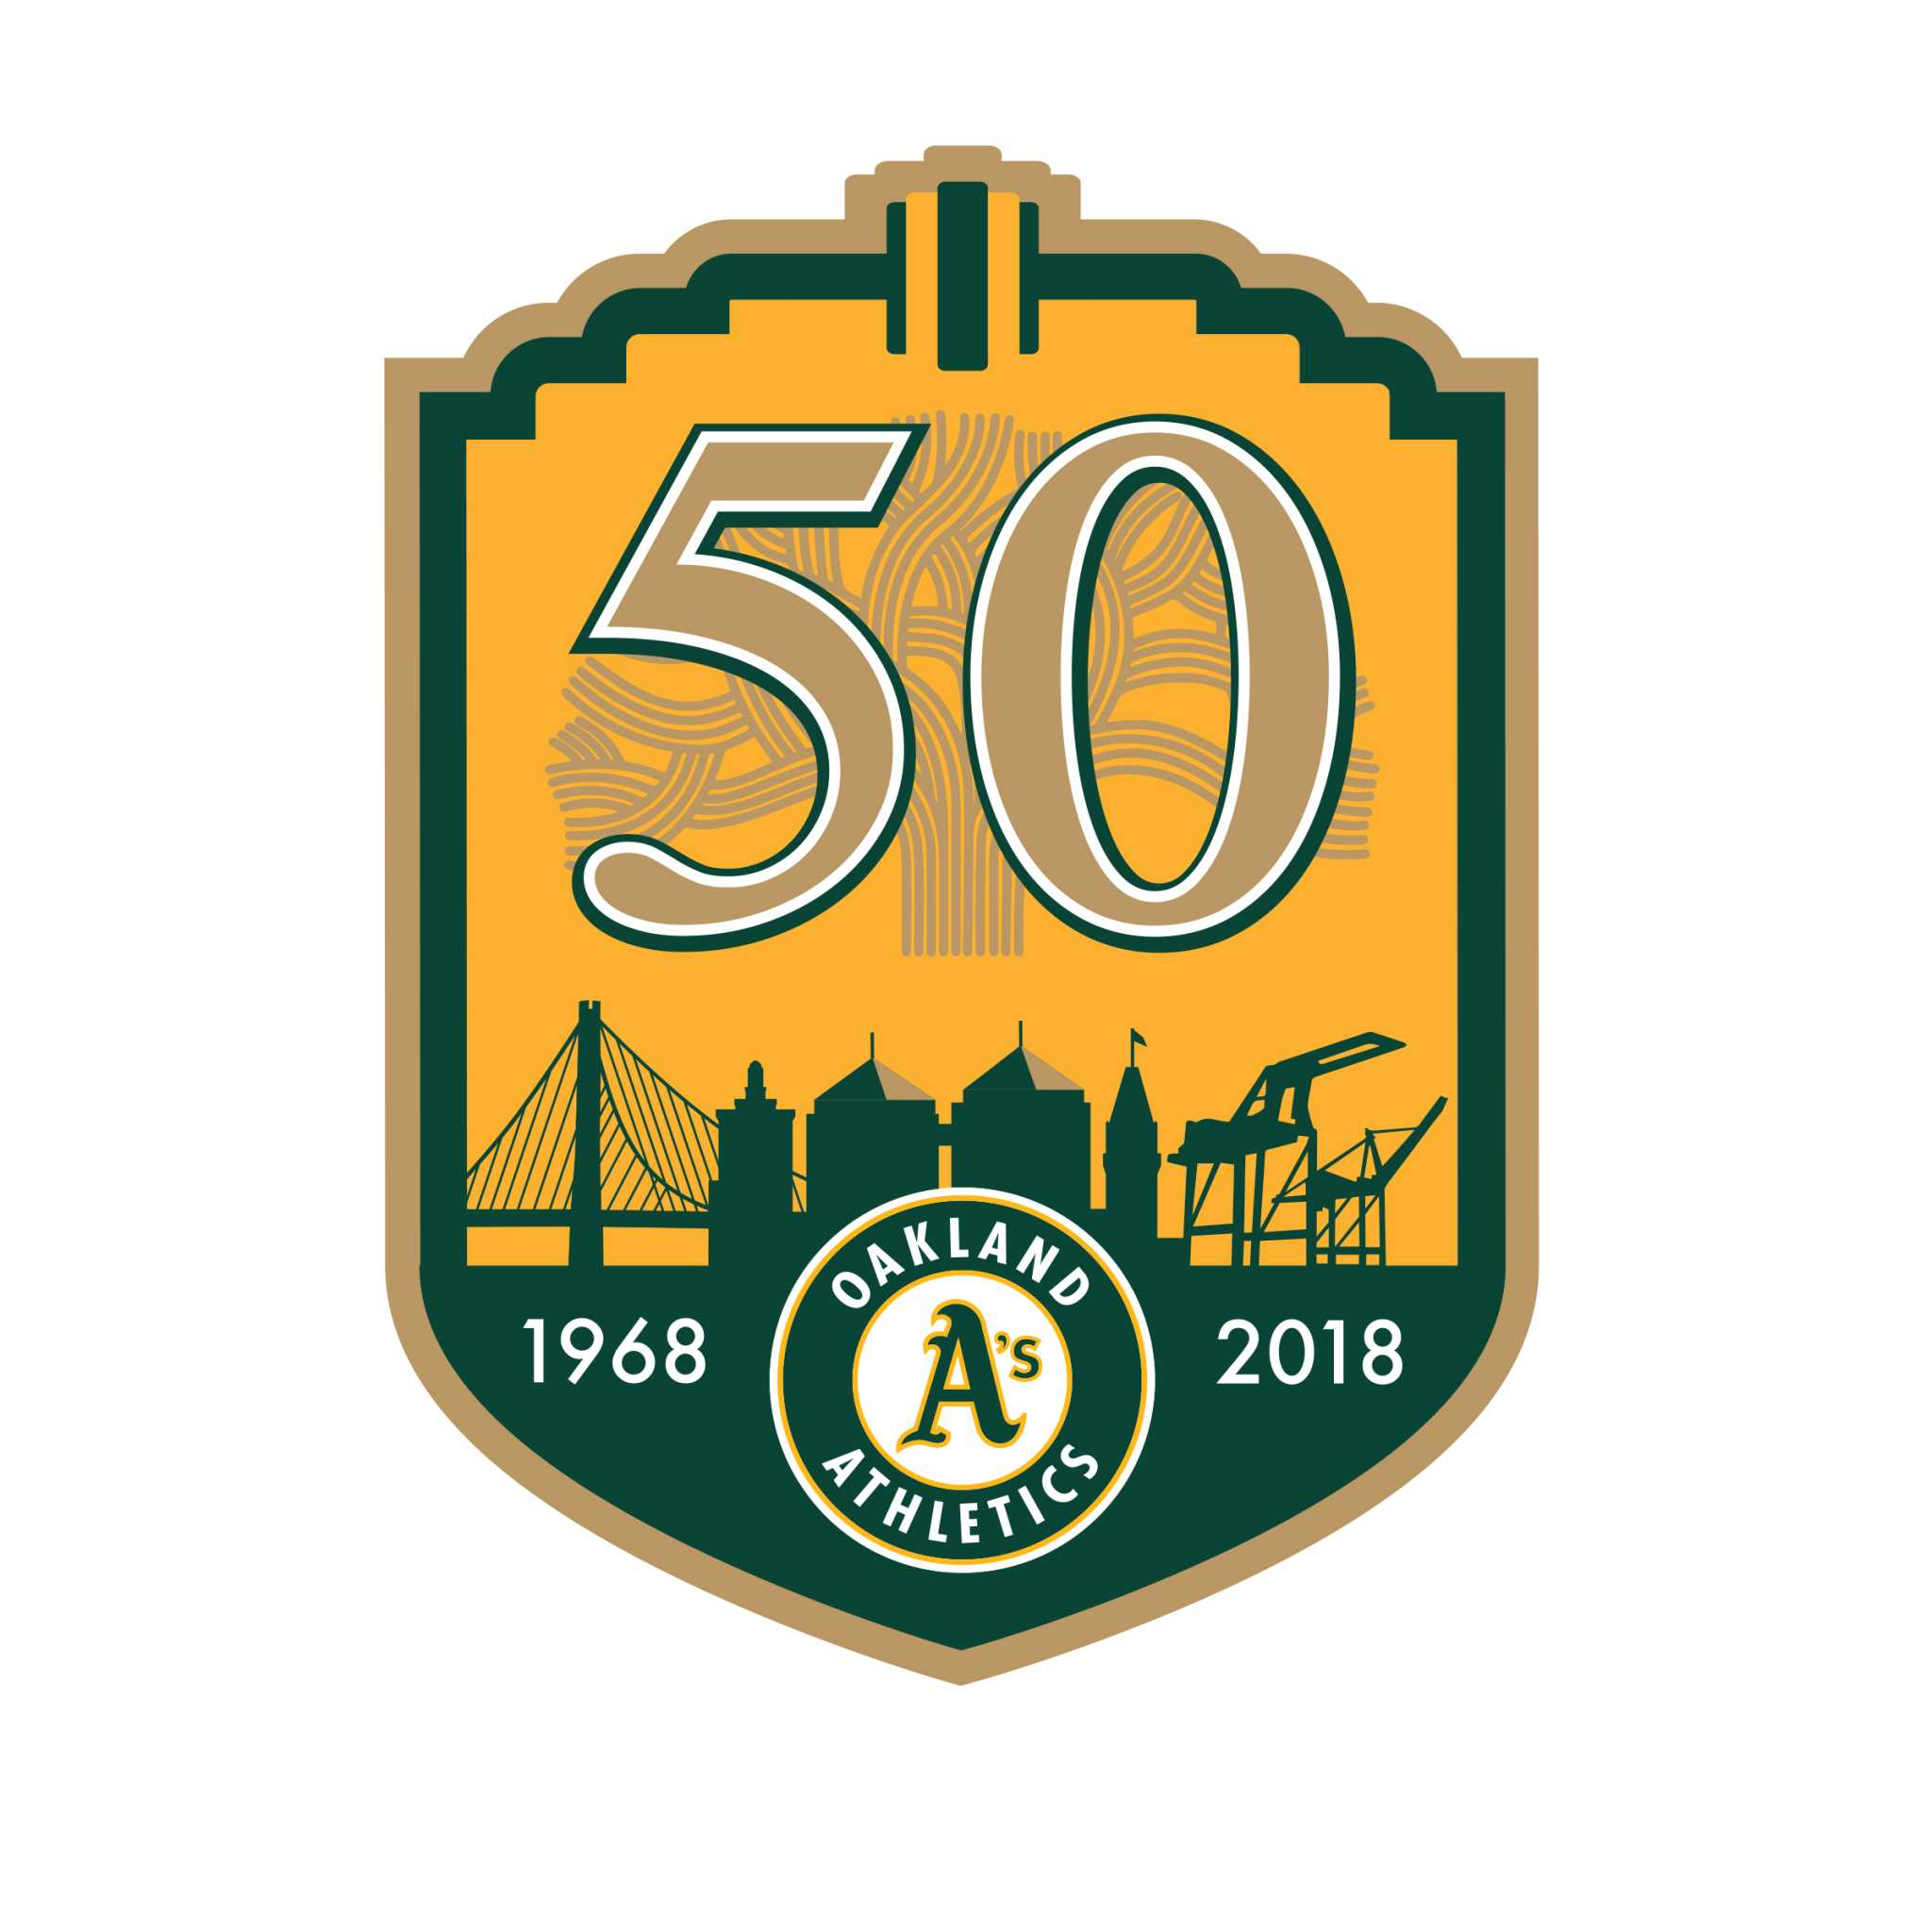 Oakland-As-50th-anniversary-logo